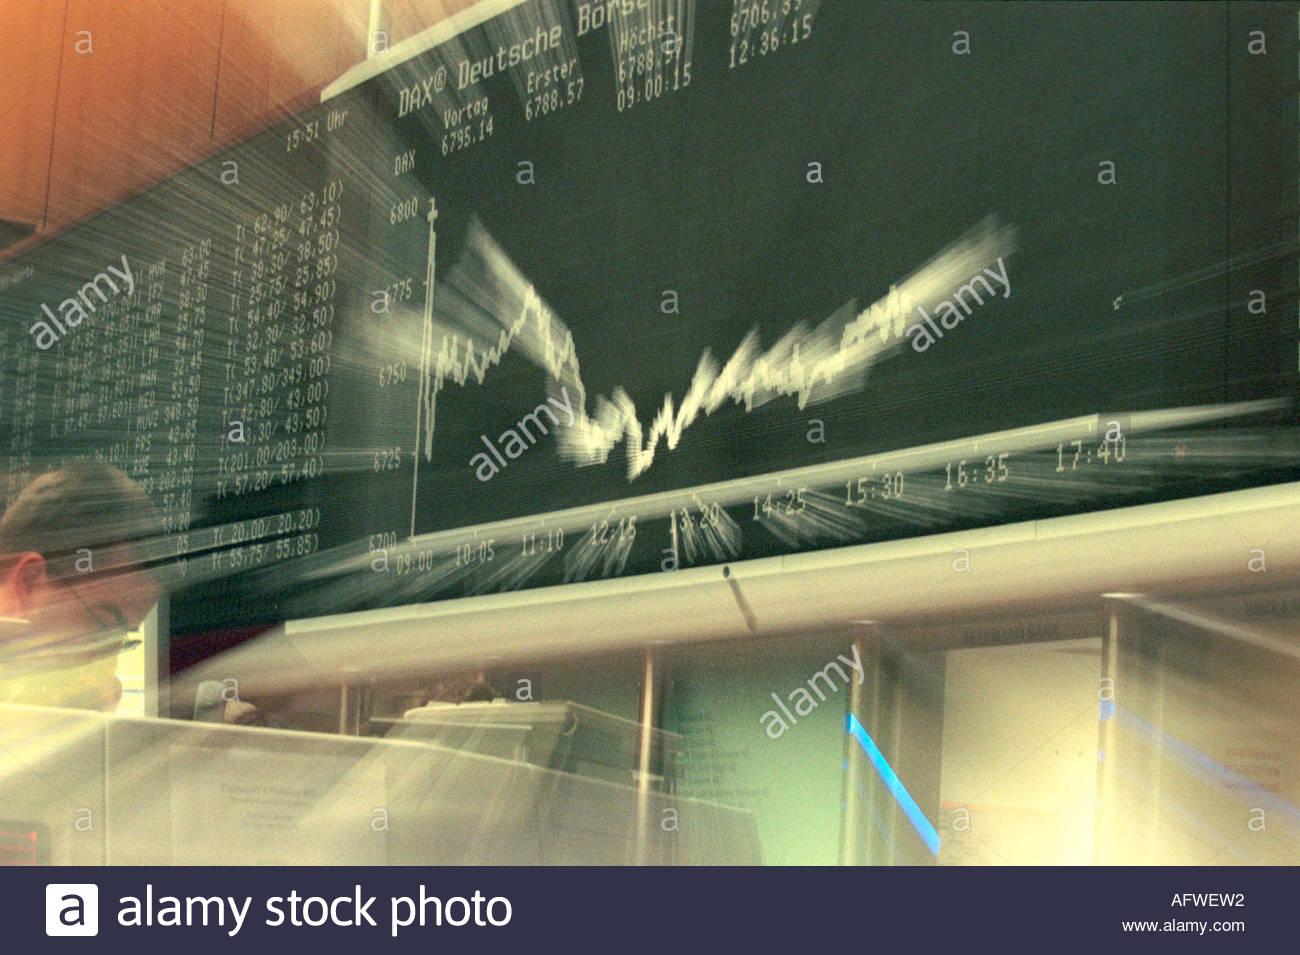 Dax Chart Stock Photo 8014865 Alamy